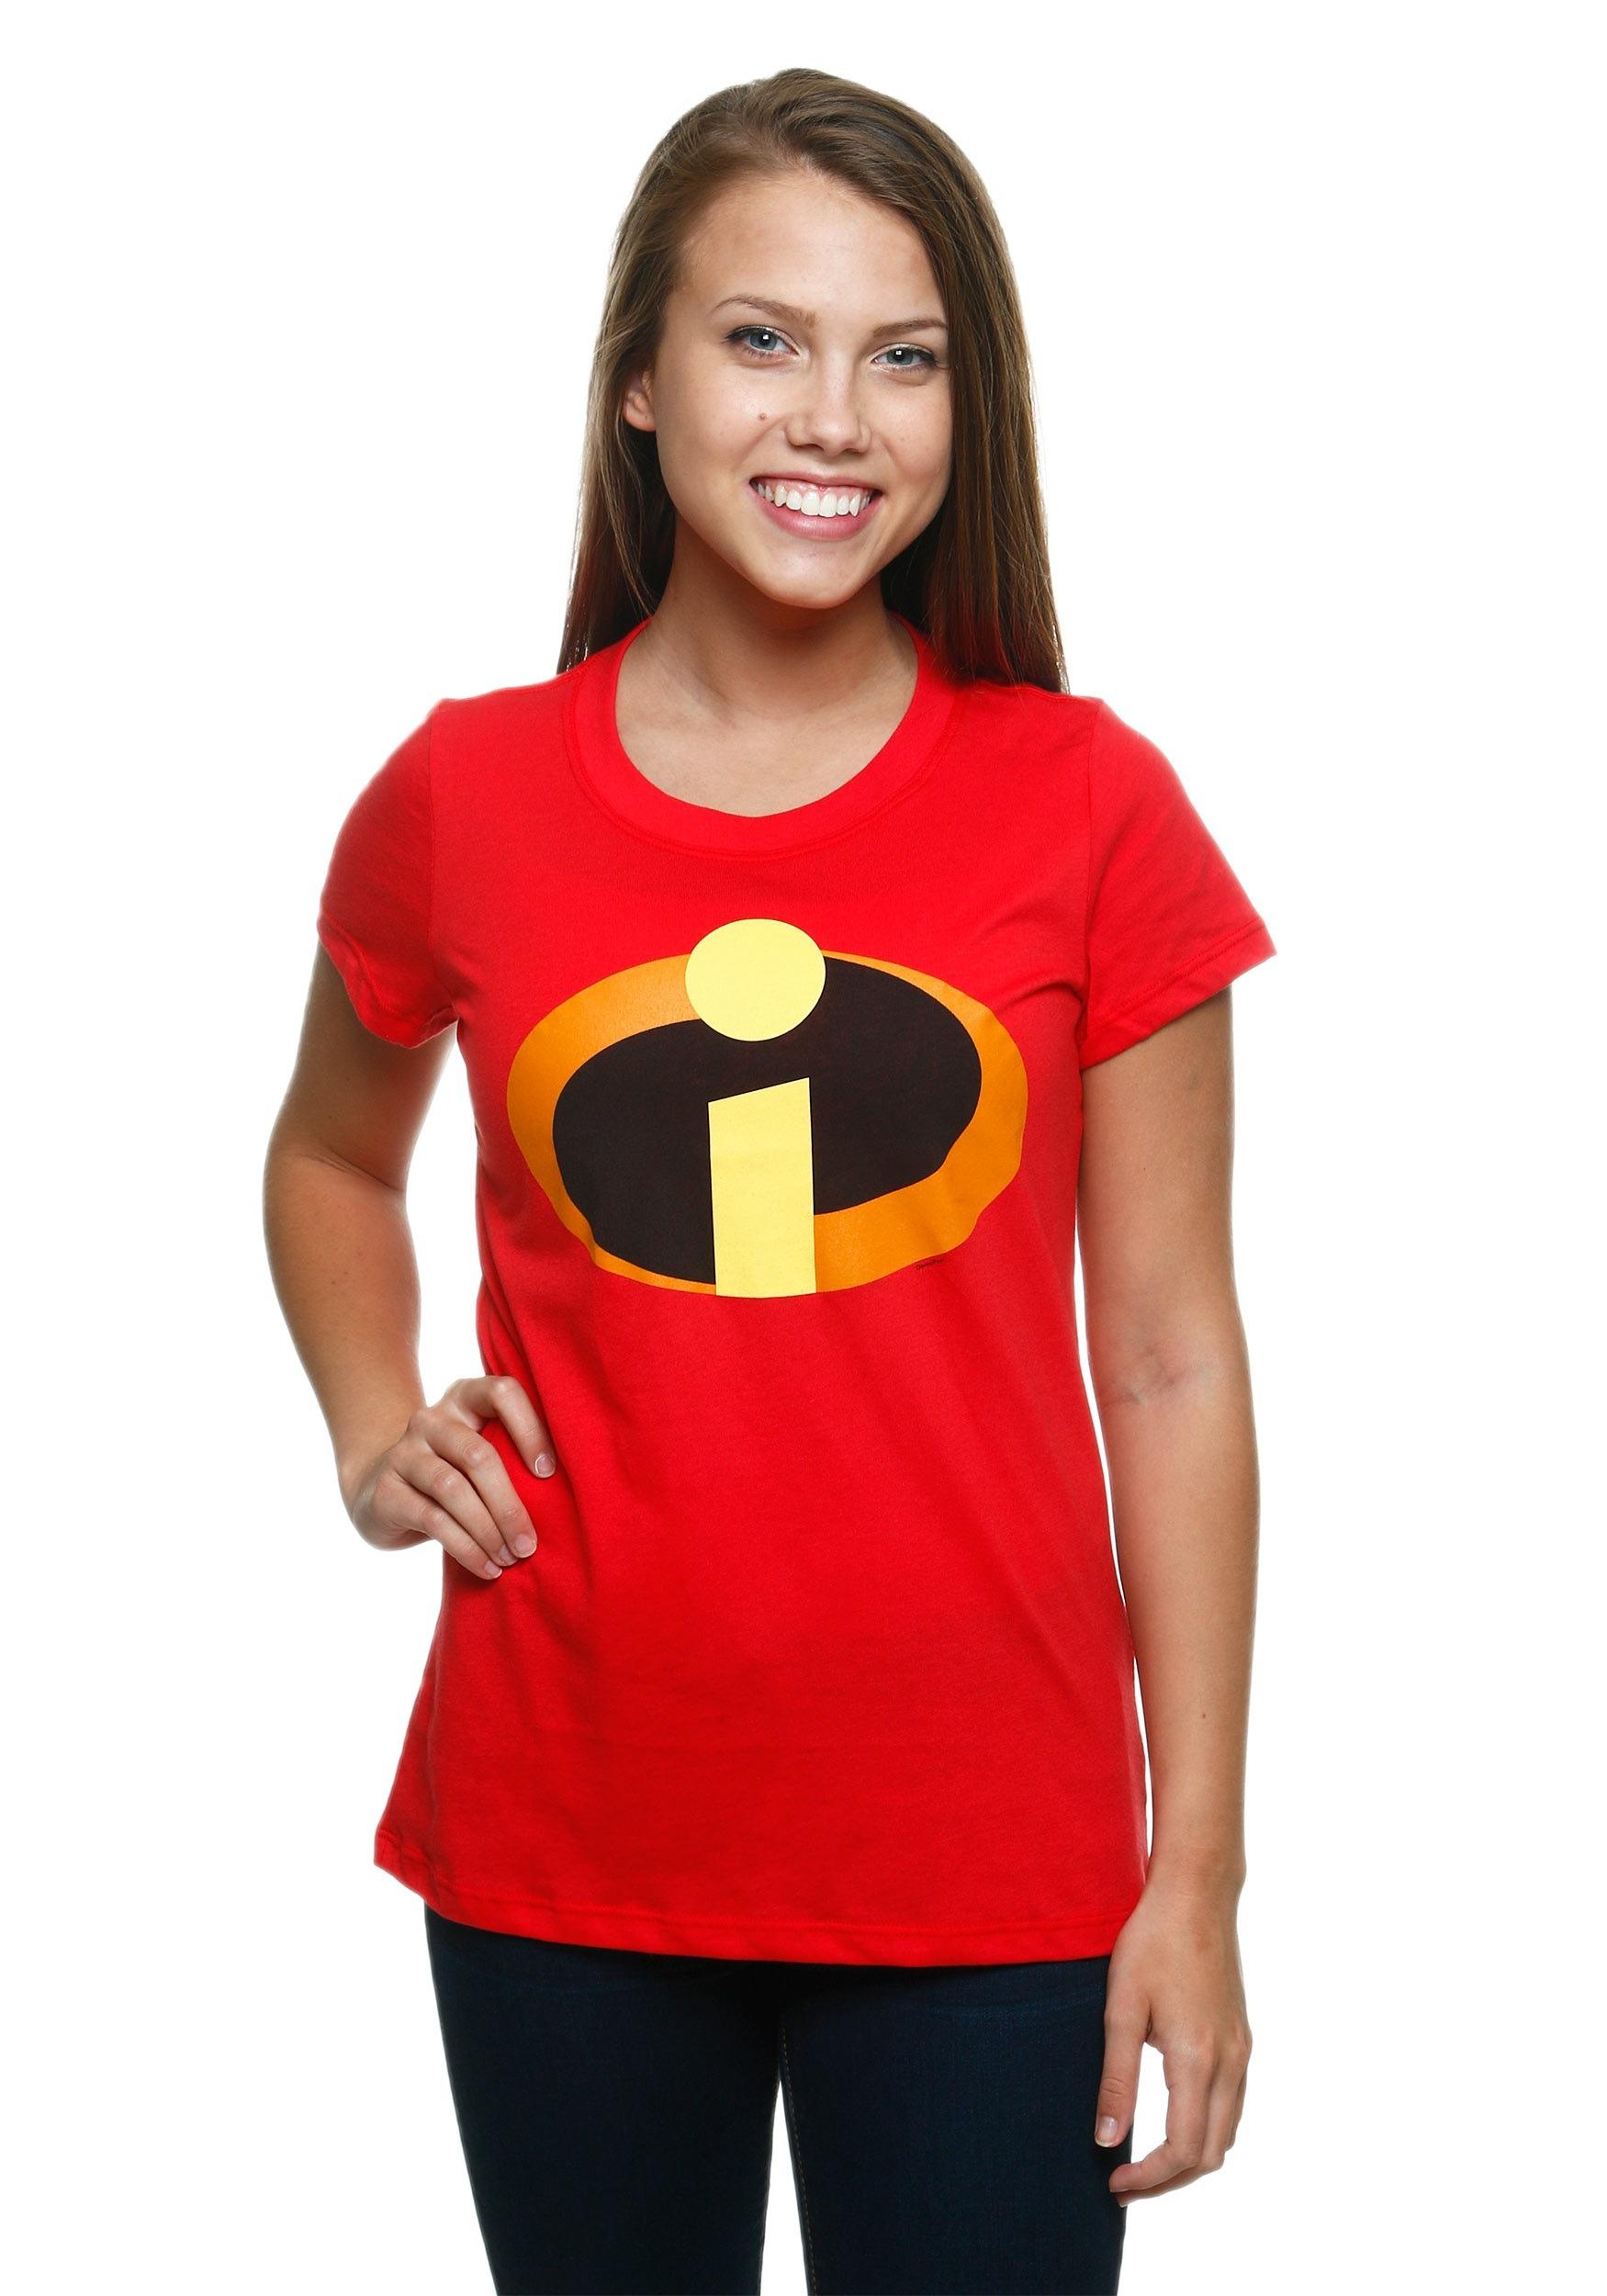 Plus Size Womens Superhero Shirts